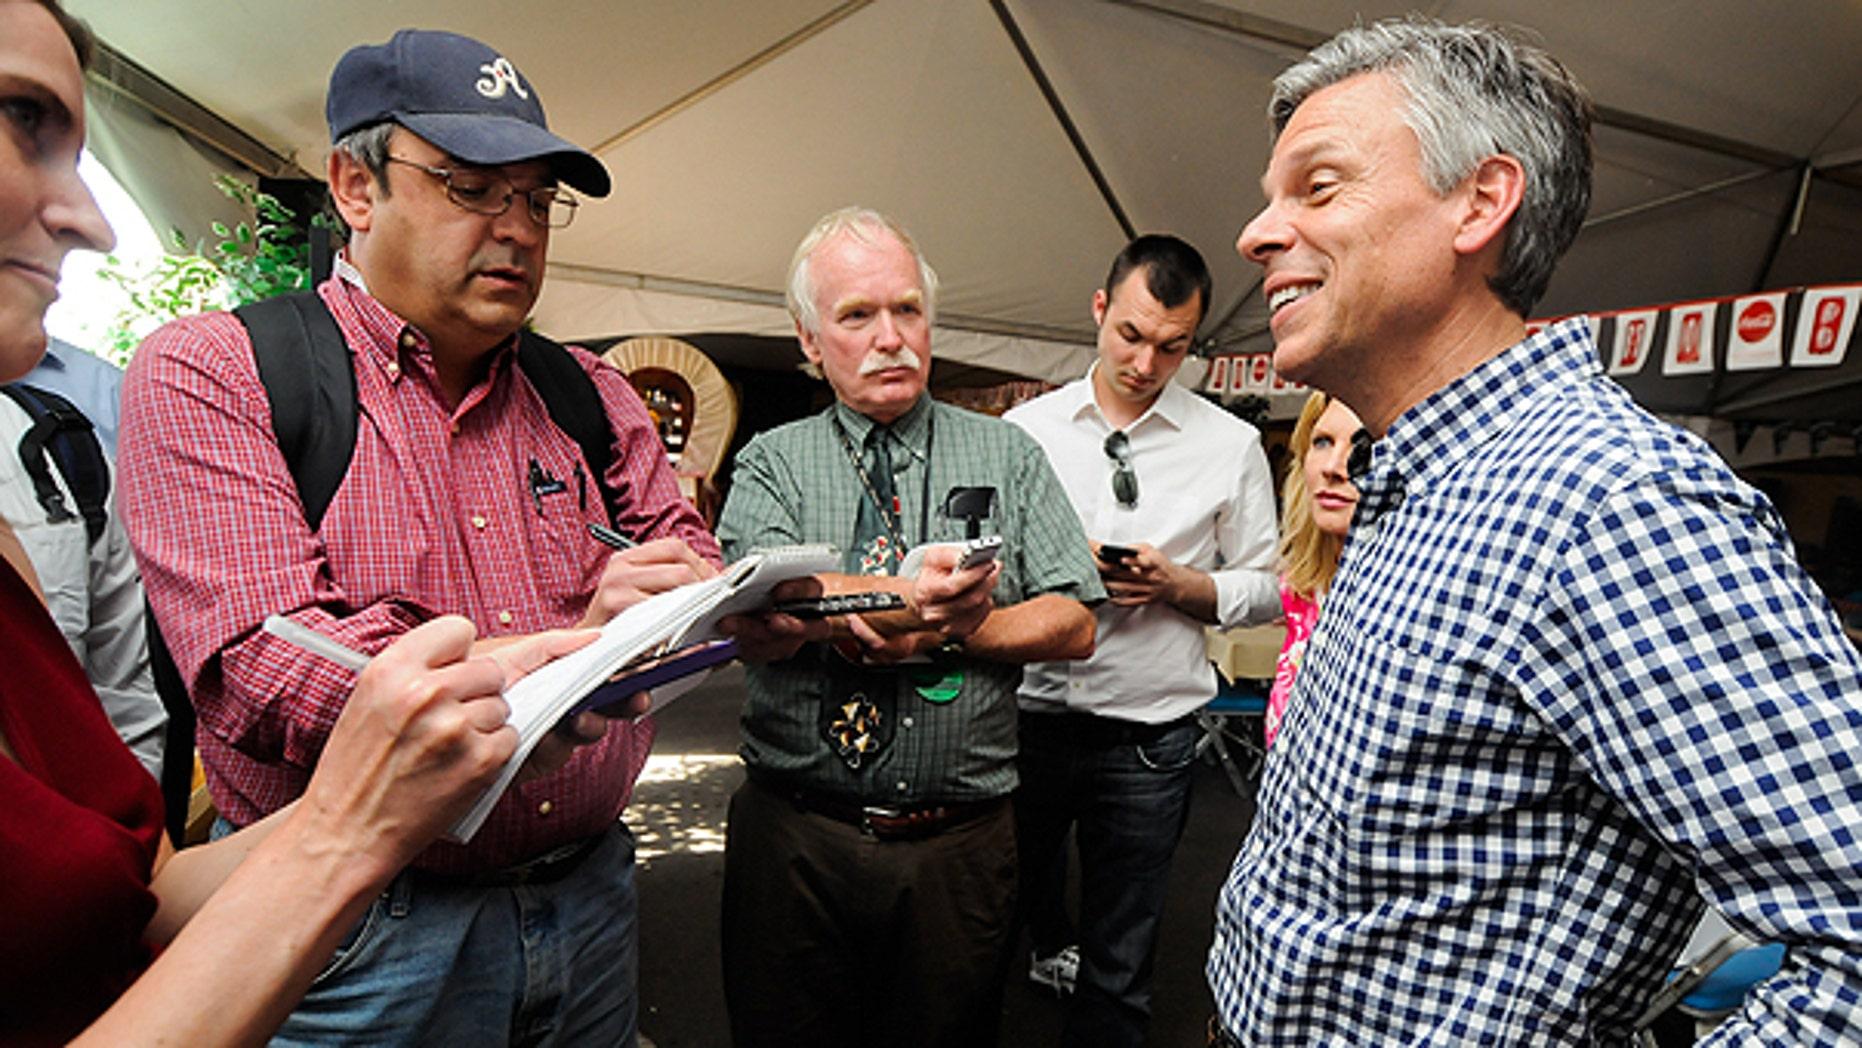 June 24: Former Utah Gov. Jon Huntsman talks to the media during a campaign stop at the Reno Rodeo in Reno, Nev.